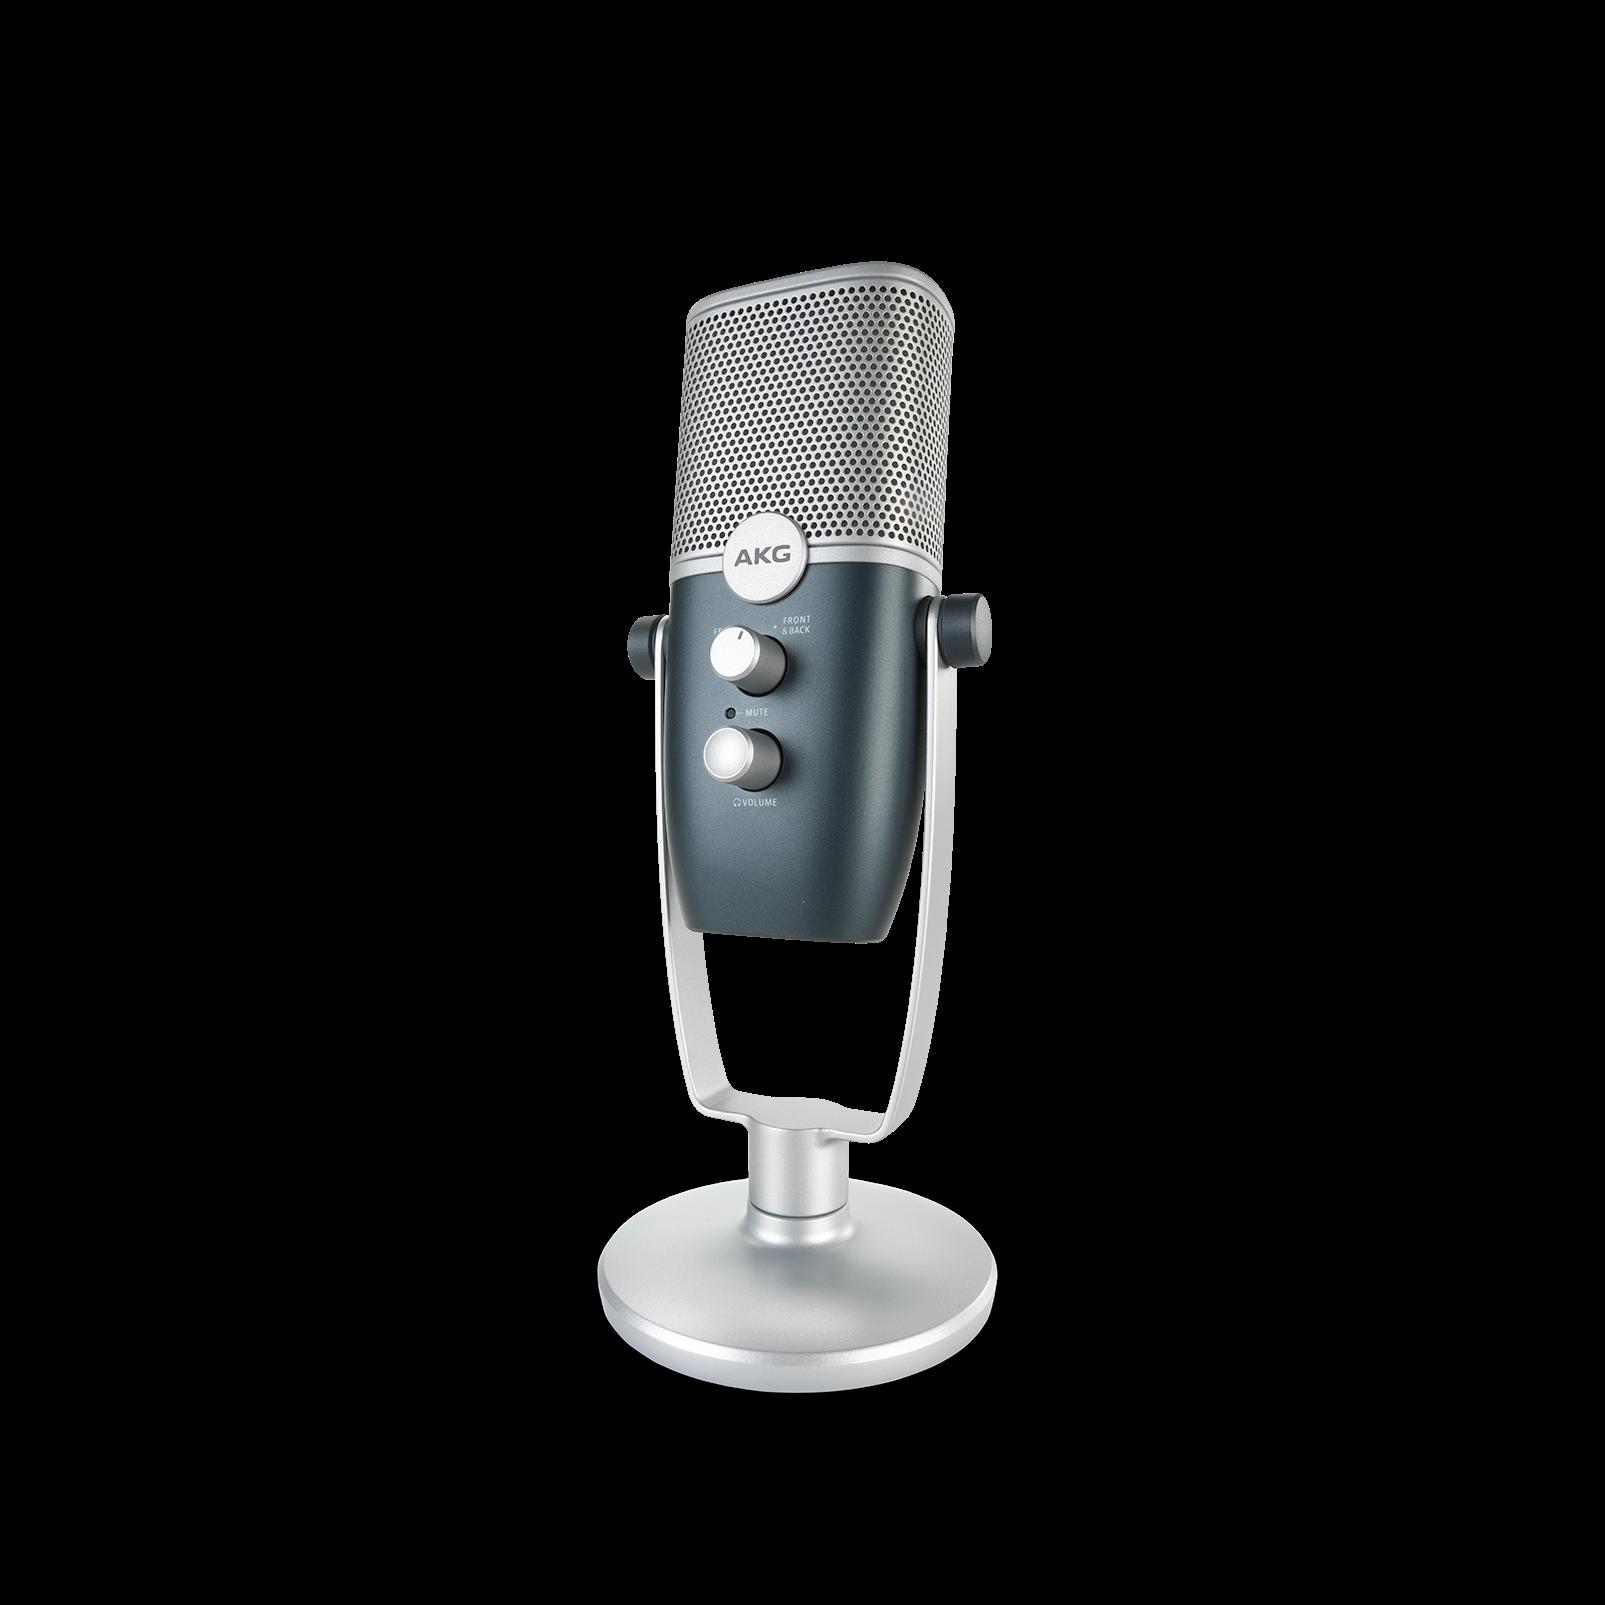 AKG Ara - Blue - Professional Two-Pattern USB Condenser Microphone - Detailshot 6